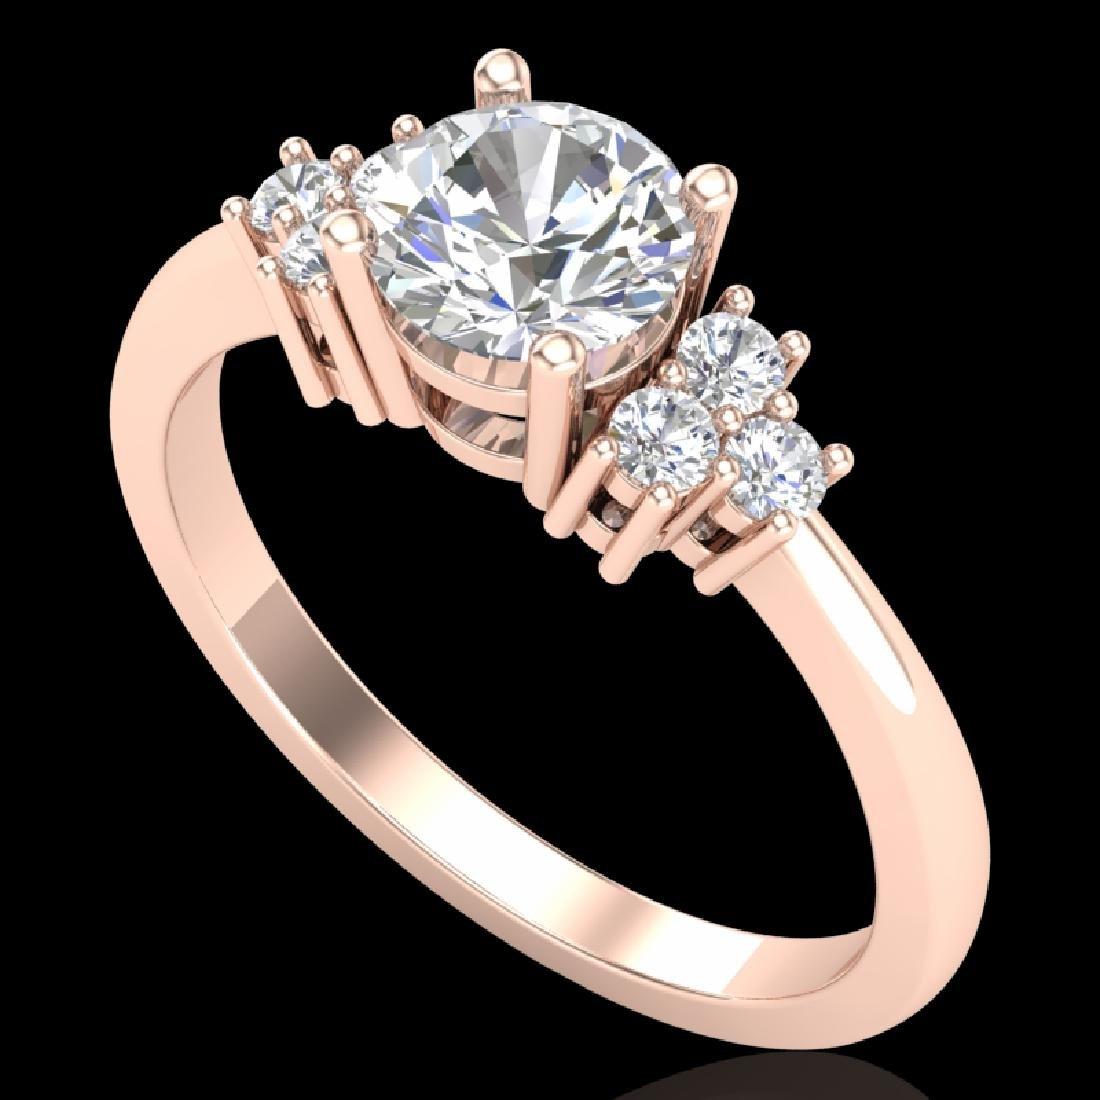 1 CTW VS/SI Diamond Ring Size 7 18K Rose Gold